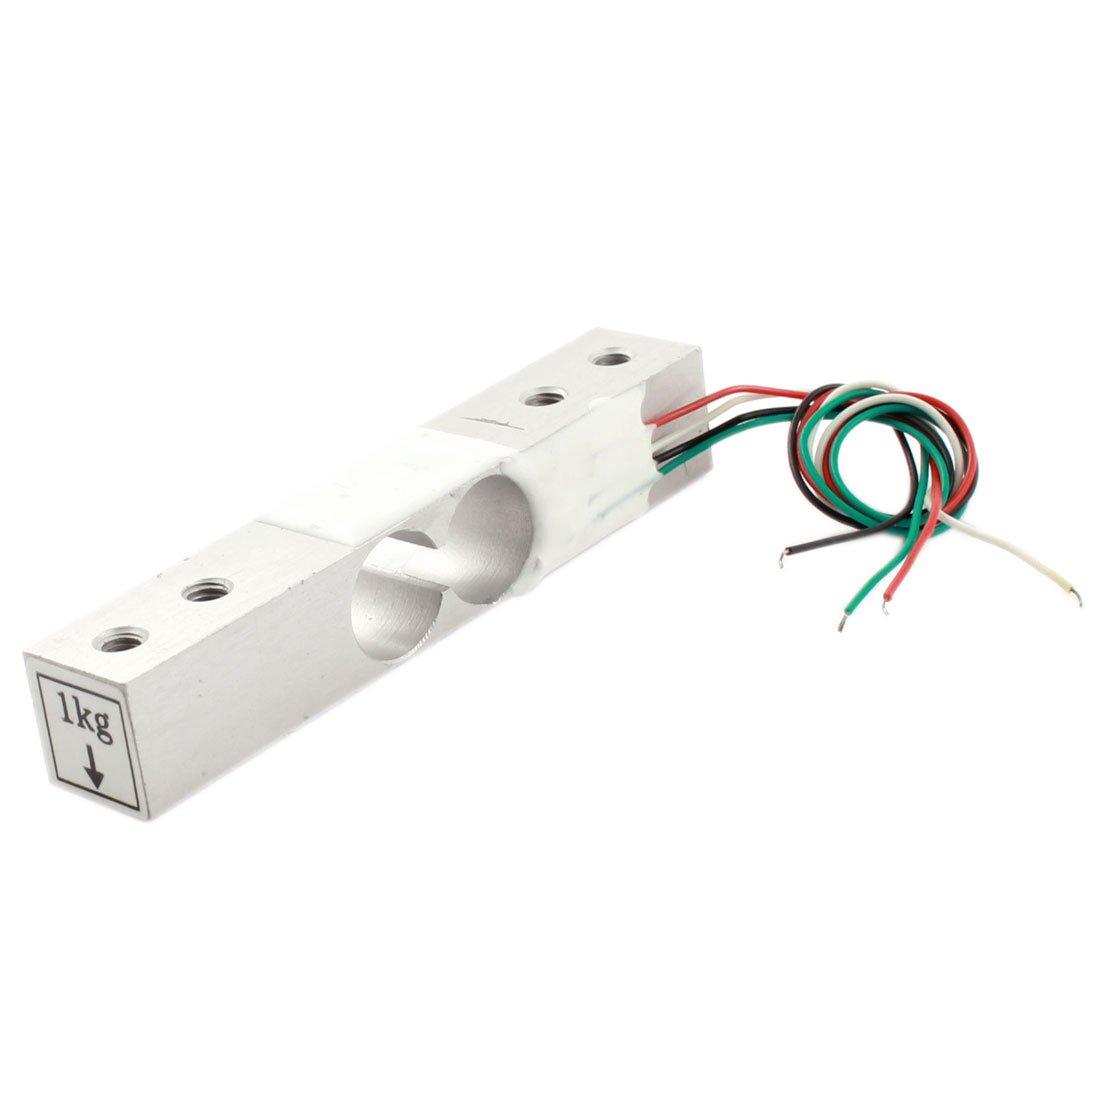 Aexit 6'' Length Sensors Wire Aluminium Alloy Micro Load Cell Weighting Vibration Sensors Sensor 1Kg